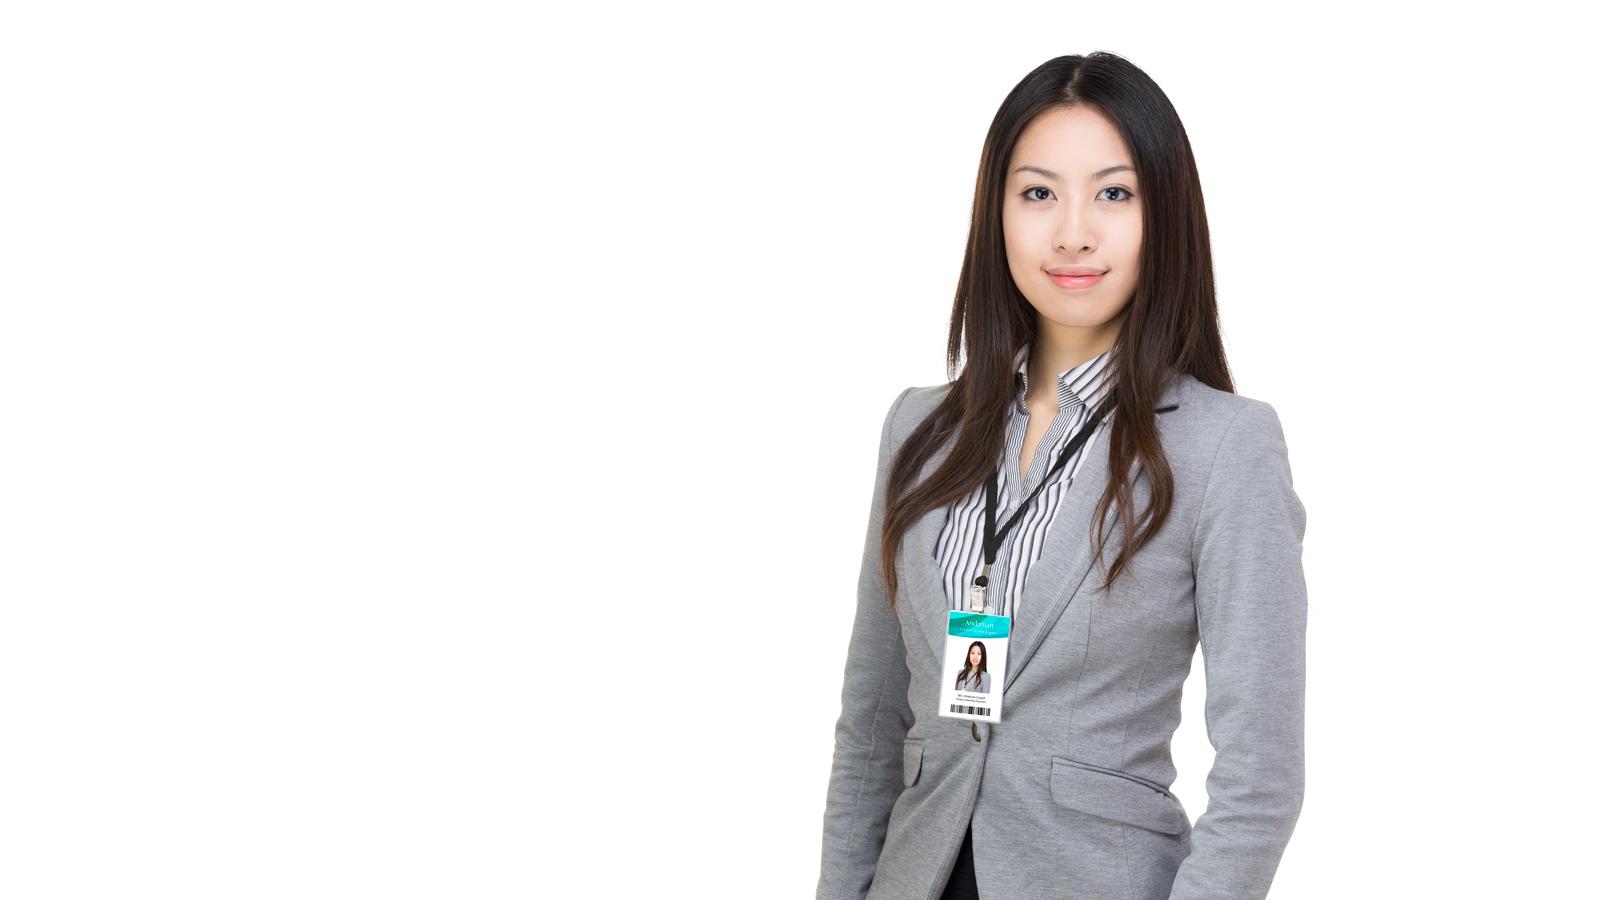 Employee-id-card Employee-id-card Employee-id-card Employee-id-card Employee-id-card Employee-id-card Employee-id-card Employee-id-card Employee-id-card